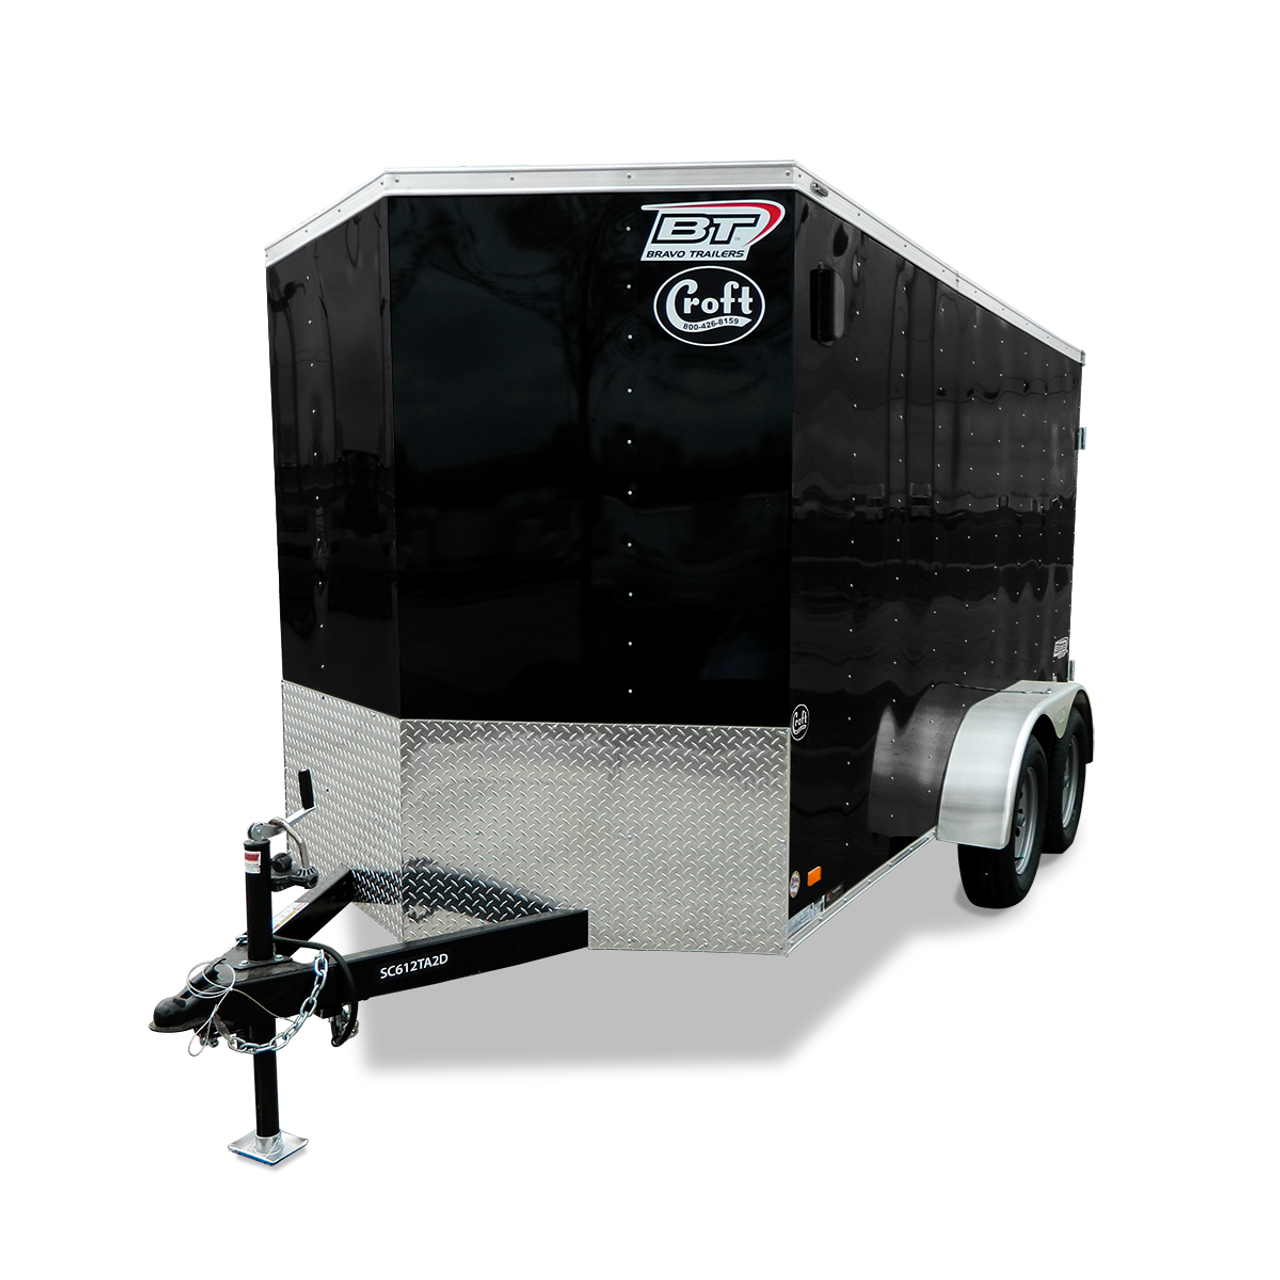 SC716TA2DRD --- 7' X 16' Enclosed Tandem Trailer with Ramp Door - Bravo